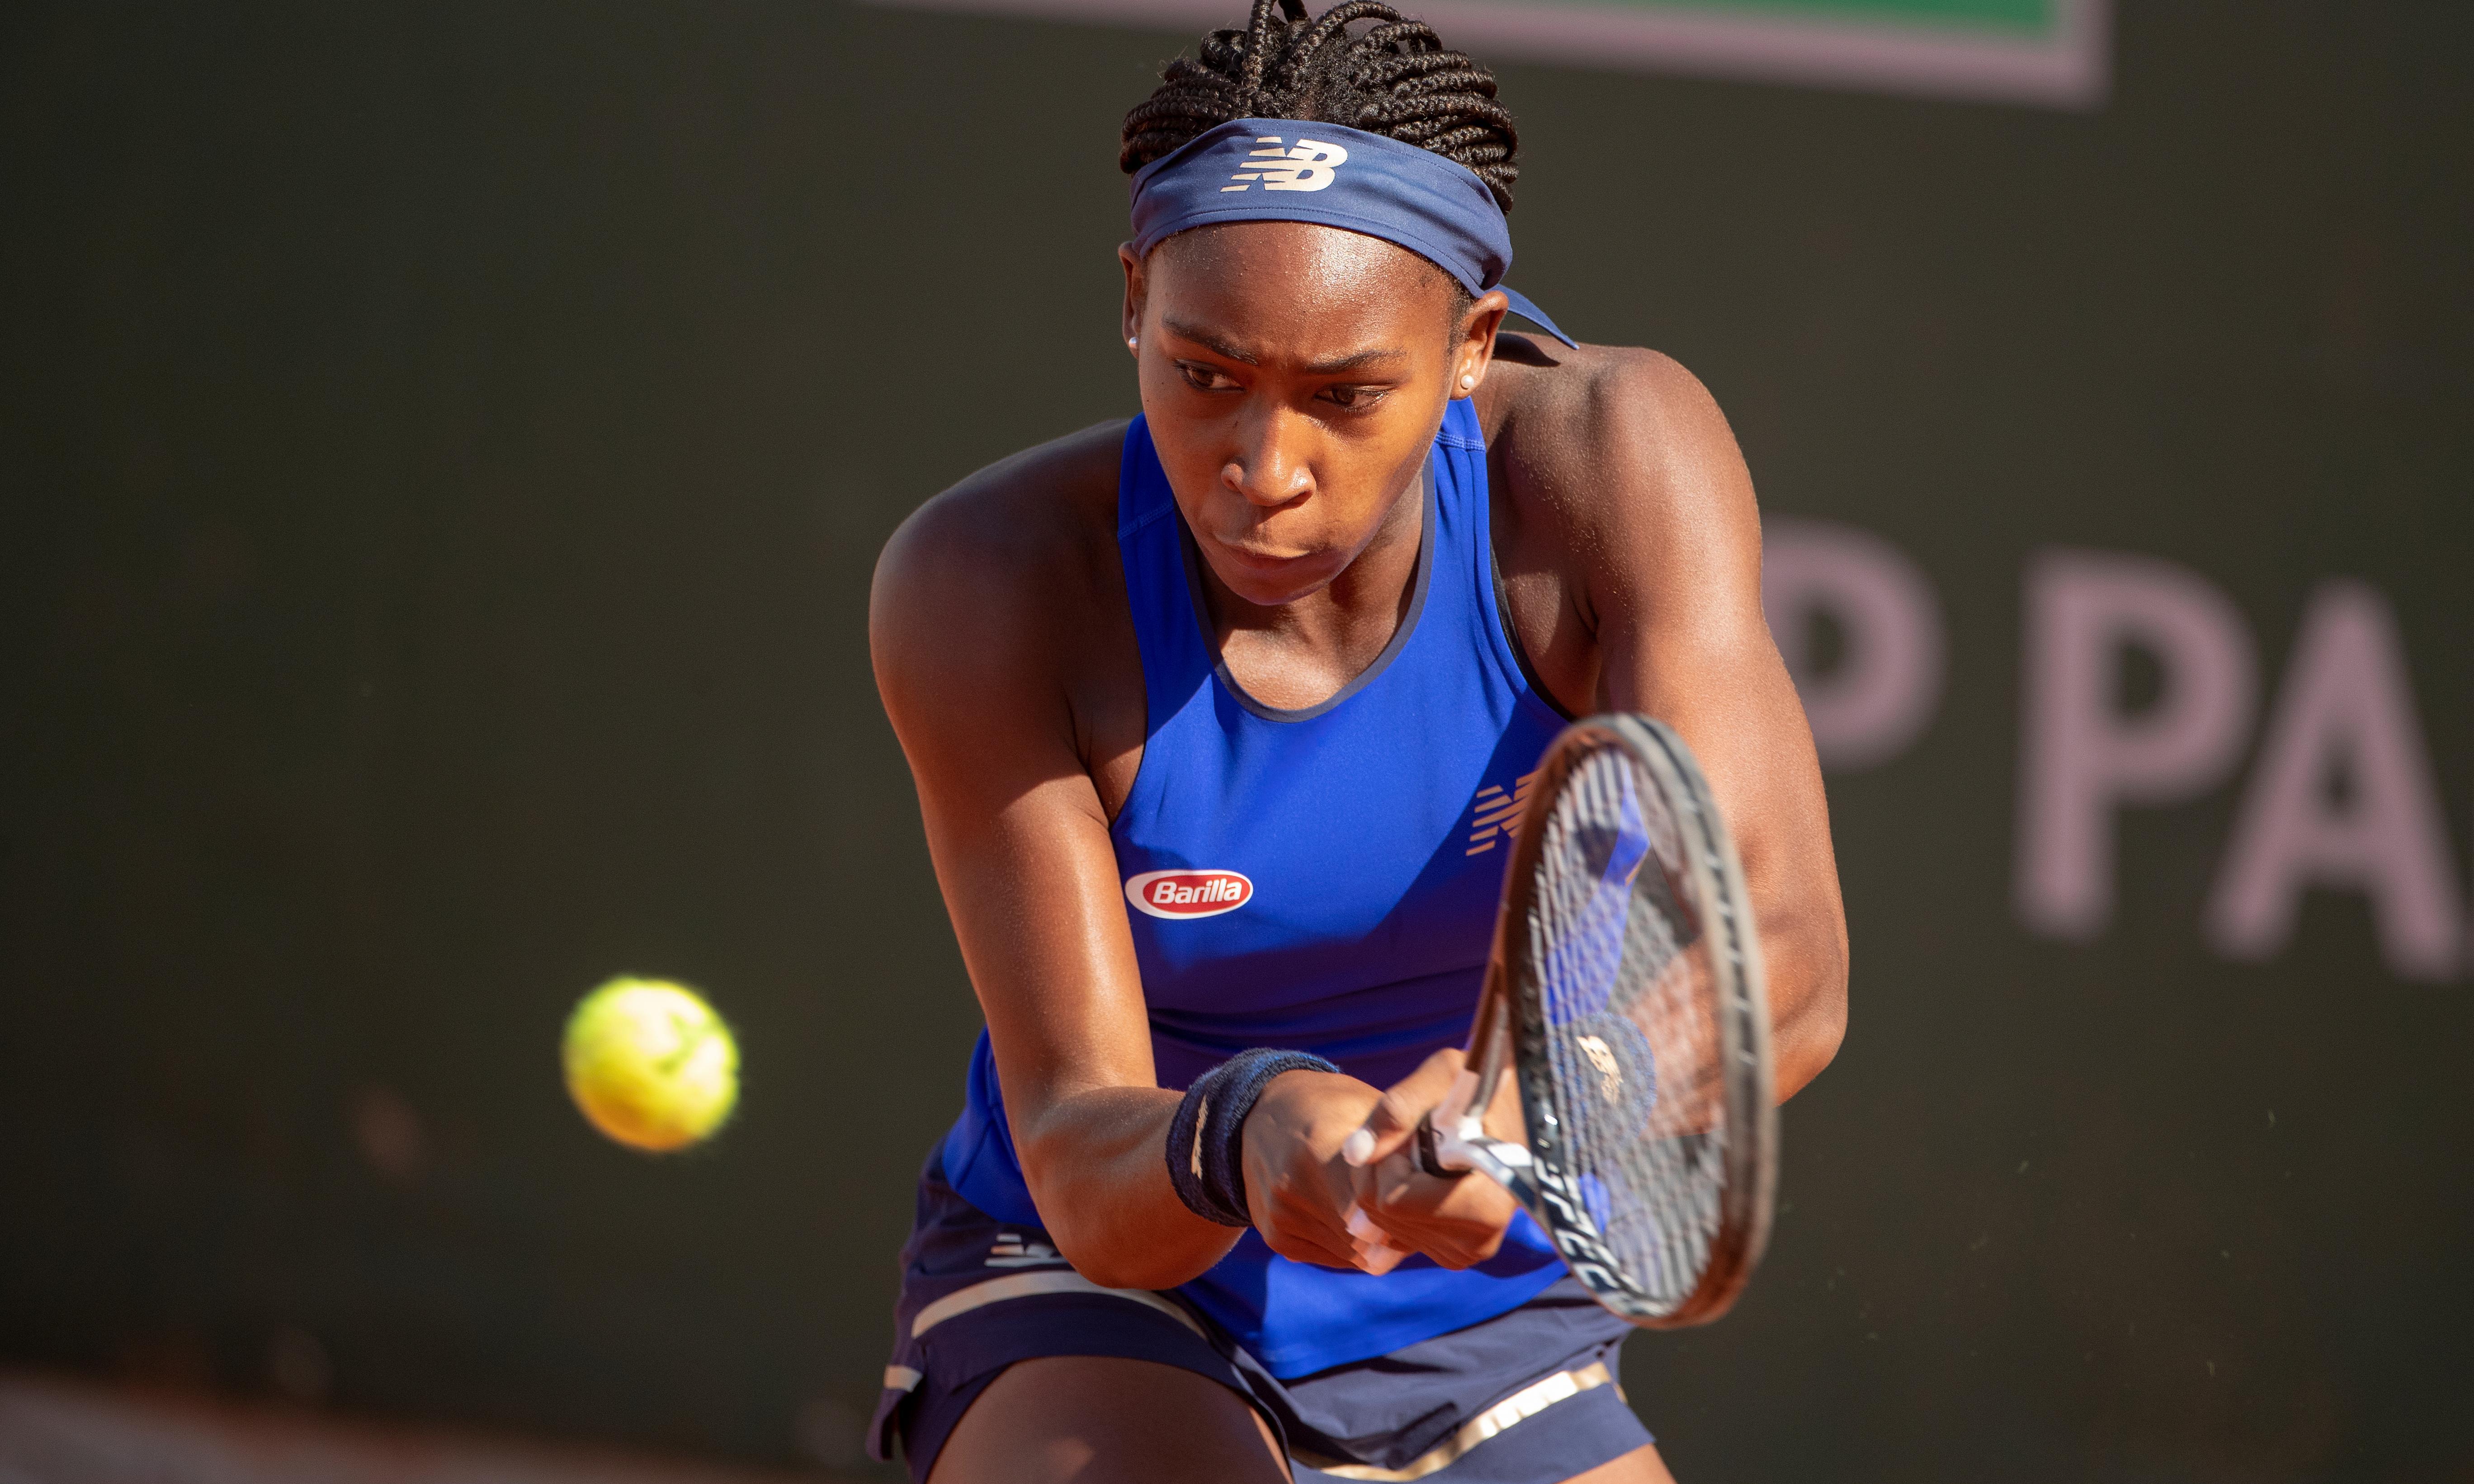 Wimbledon 2019: Venus Williams and Cori Gauff to play generation game